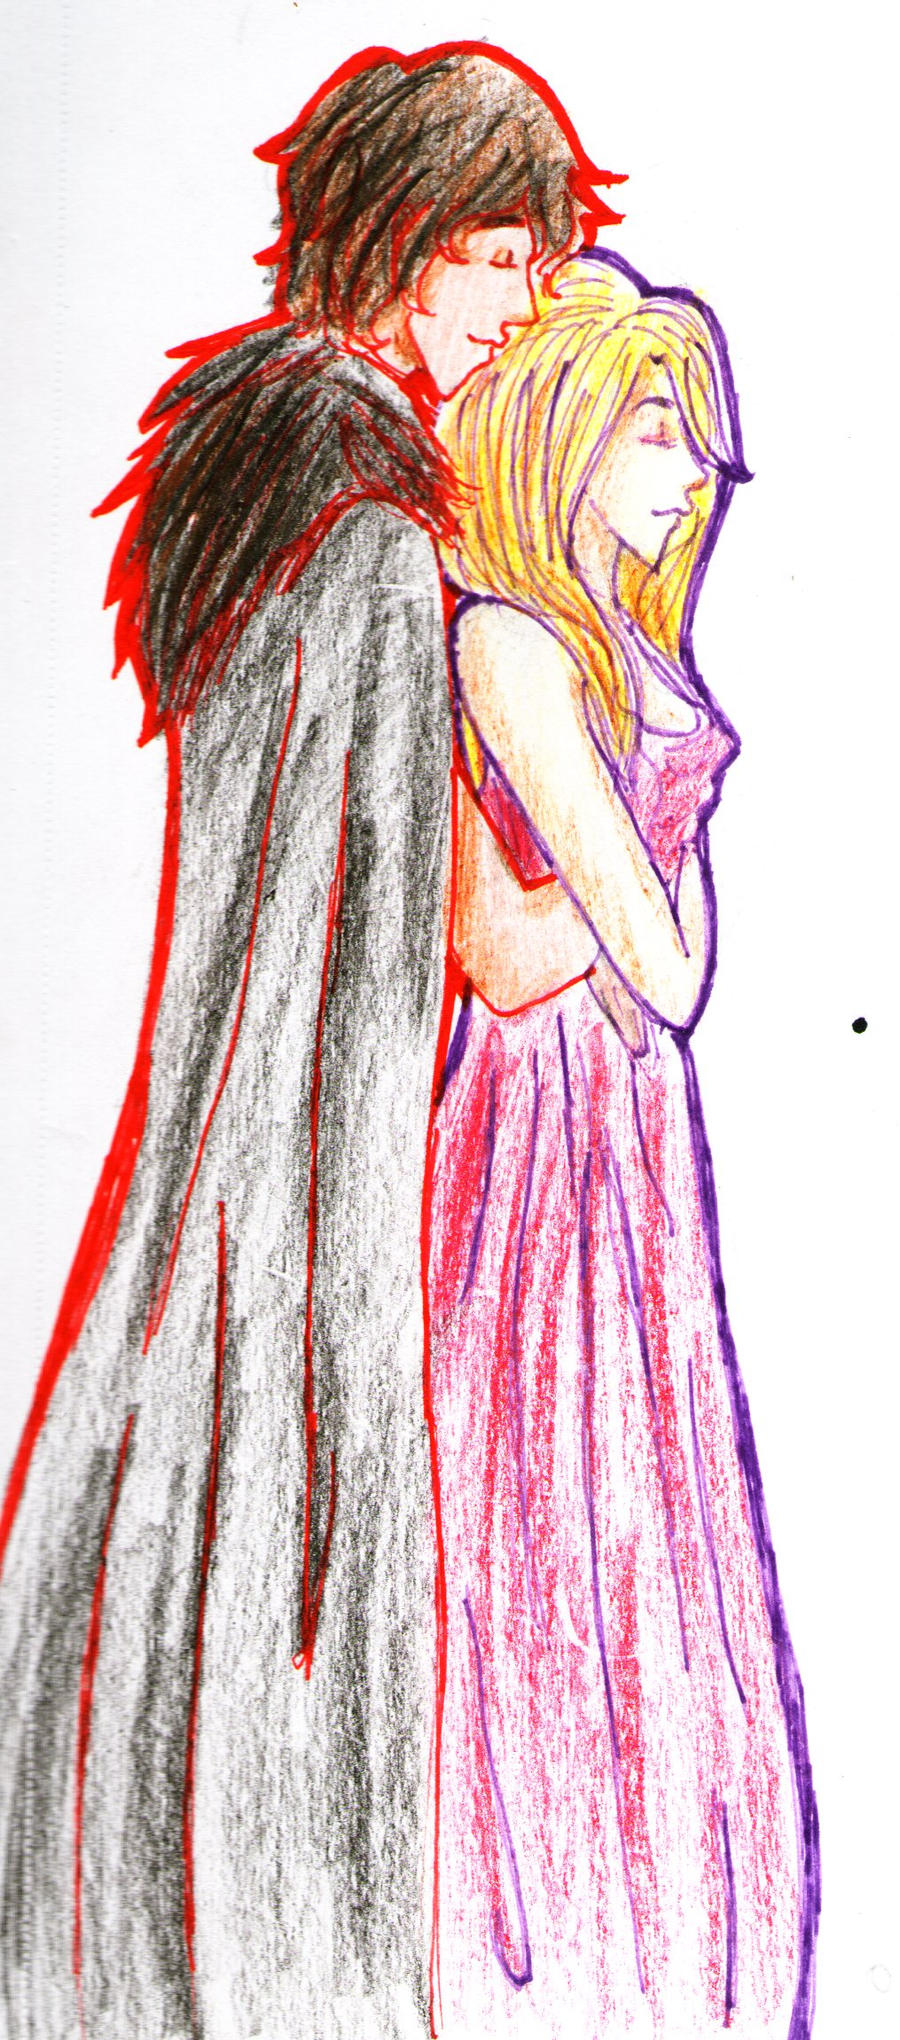 Aphrodite art and fashion Aphrodite, An Odyssey of Art Fashion - Facebook